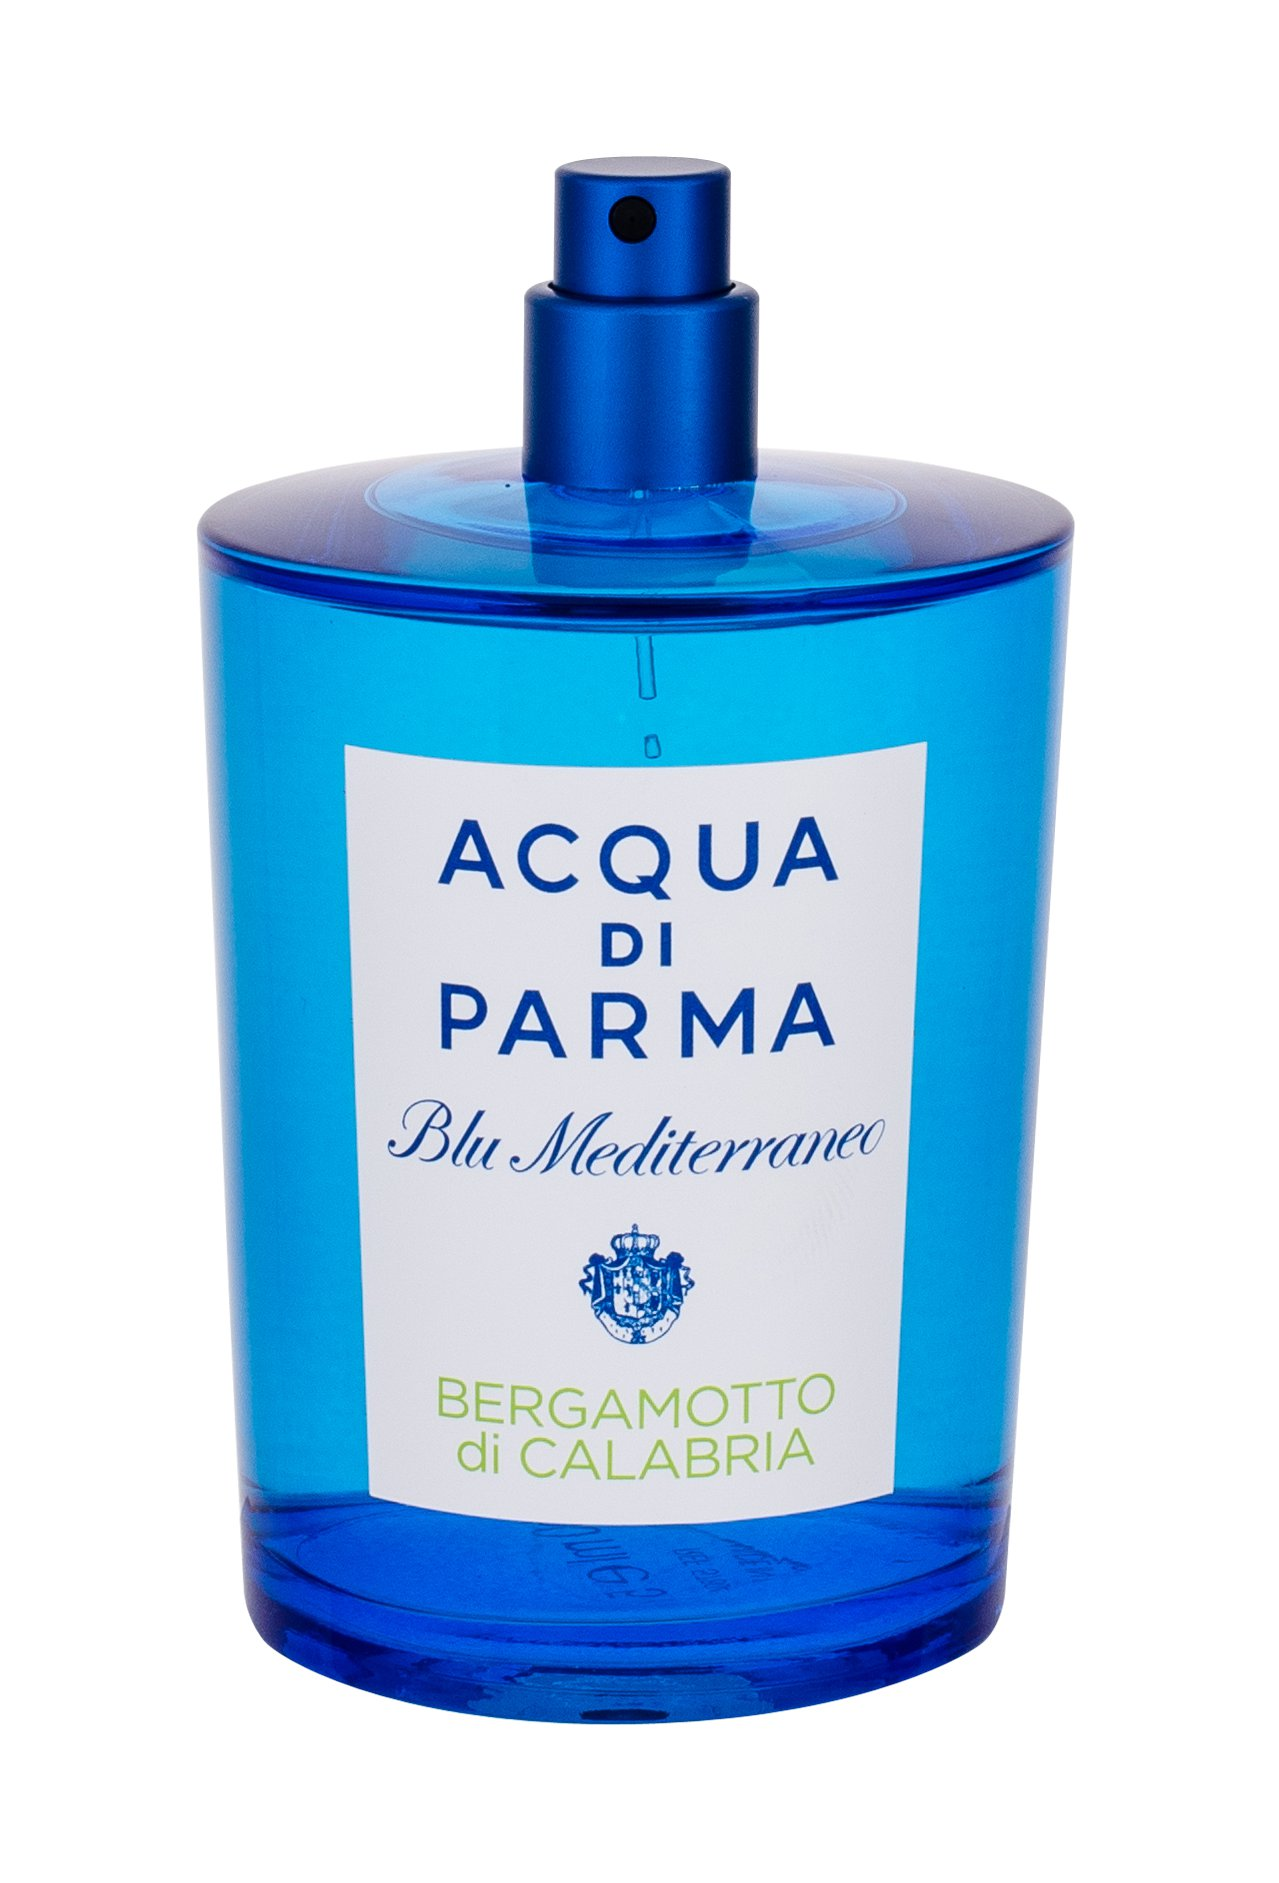 Acqua di Parma Blu Mediterraneo Bergamotto di Calabria, Toaletná voda 150ml, Tester